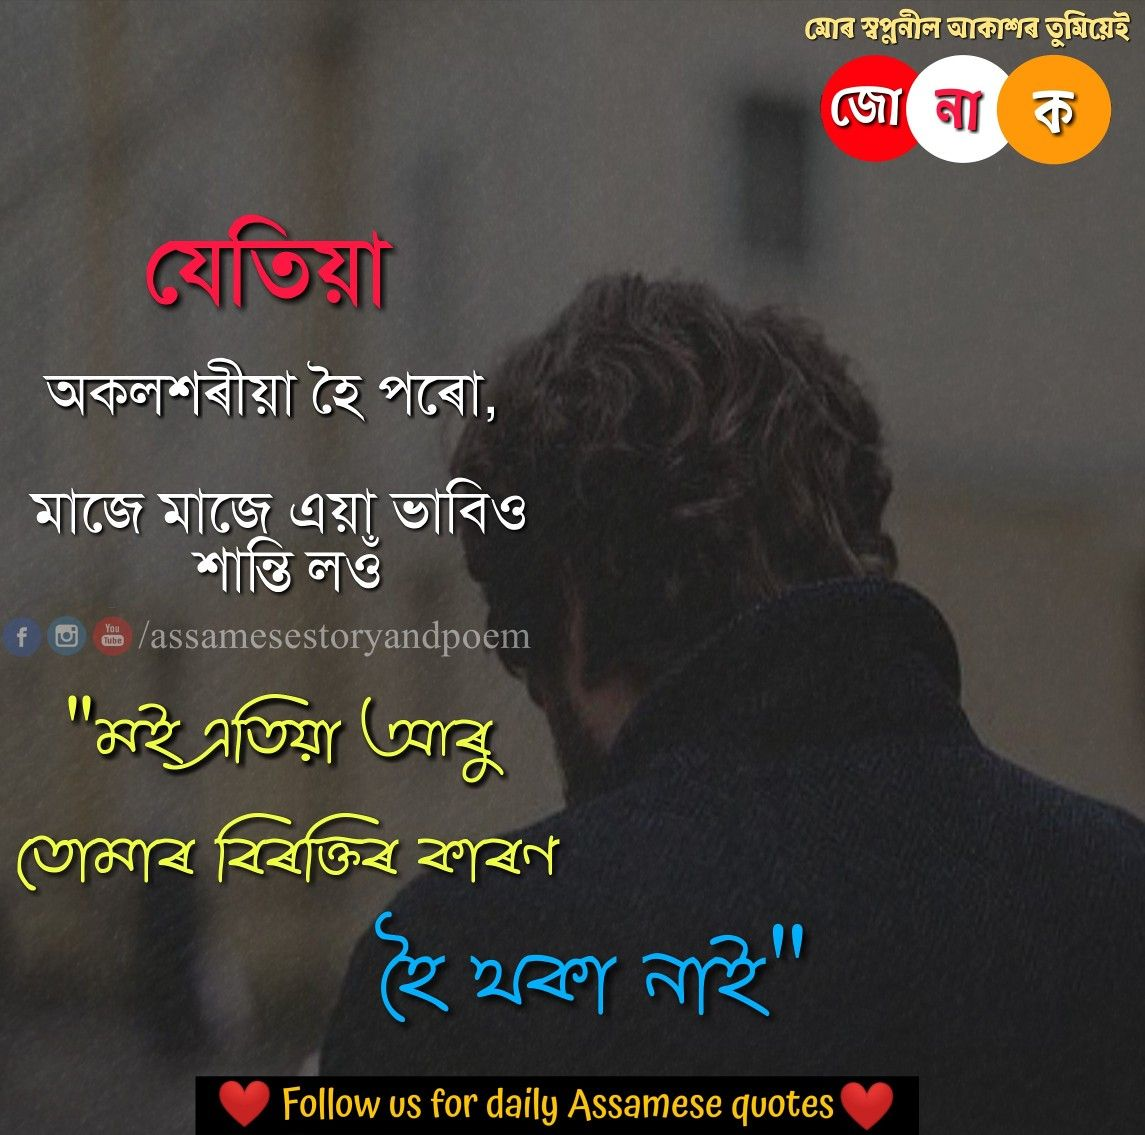 Pin by মোৰ স্বপ্ননীল আকাশৰ তুমিয়েই